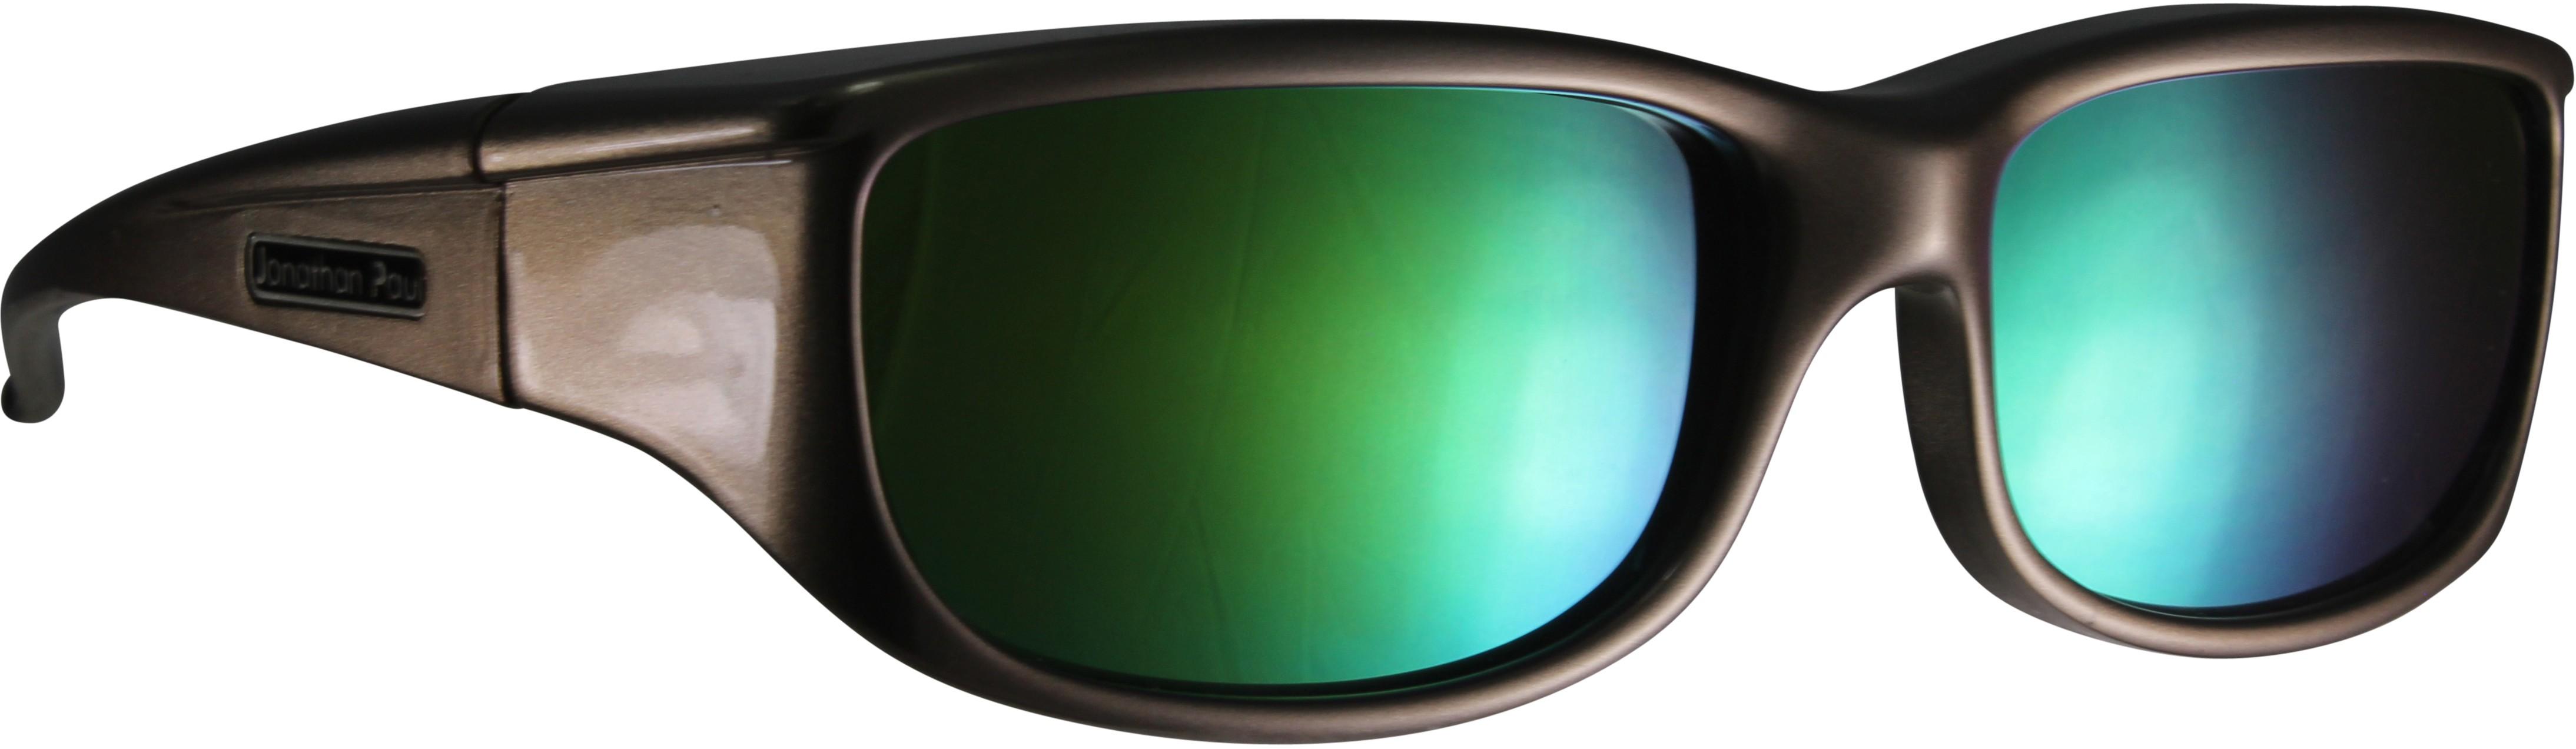 ebb6f6d00c46 Fitovers by Jonathan Paul Style Line Euroka Polarized Sunglasses ...